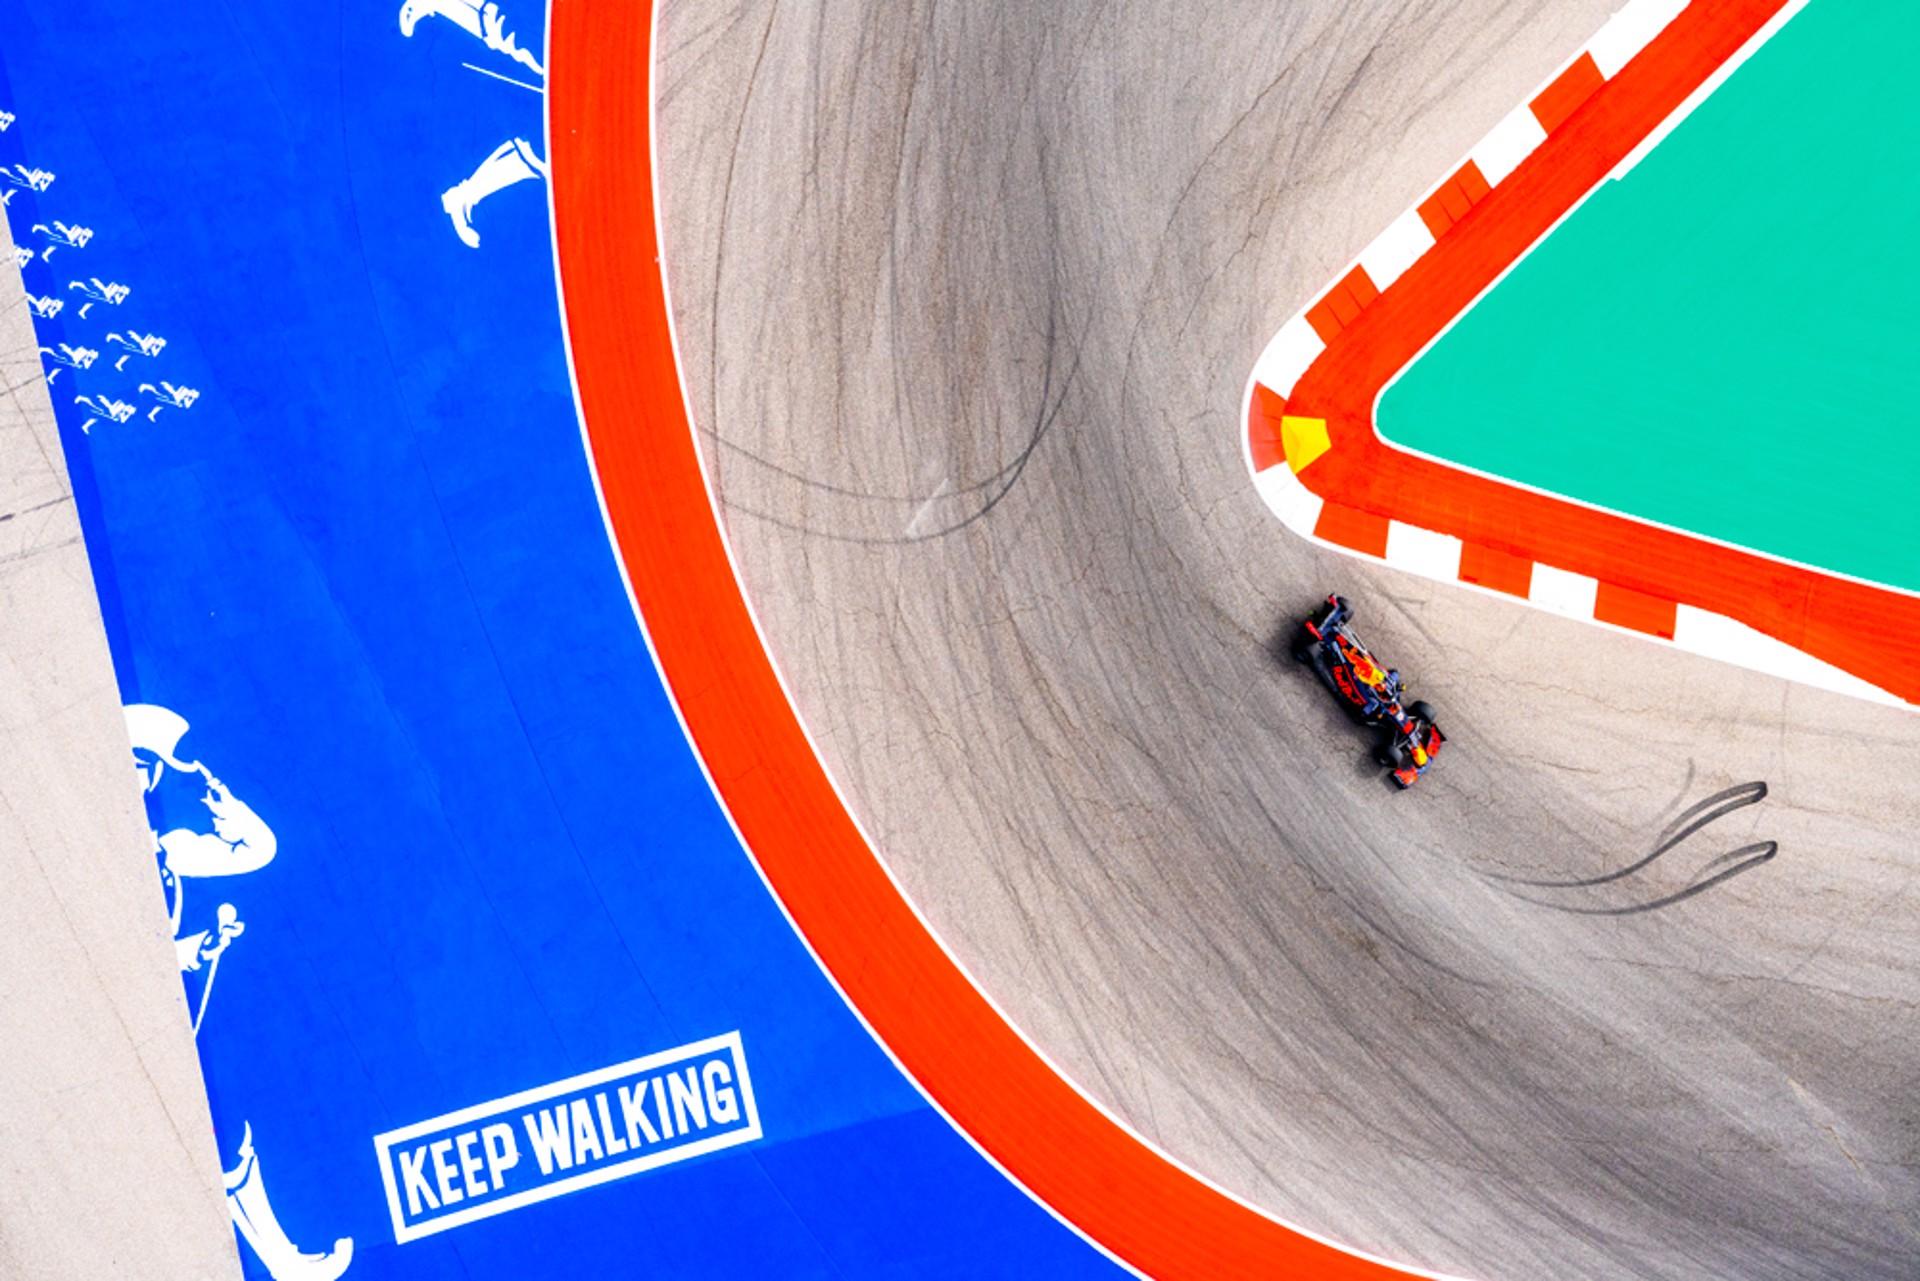 Walker Formula 1, Austin Texas by Dinesh Boaz